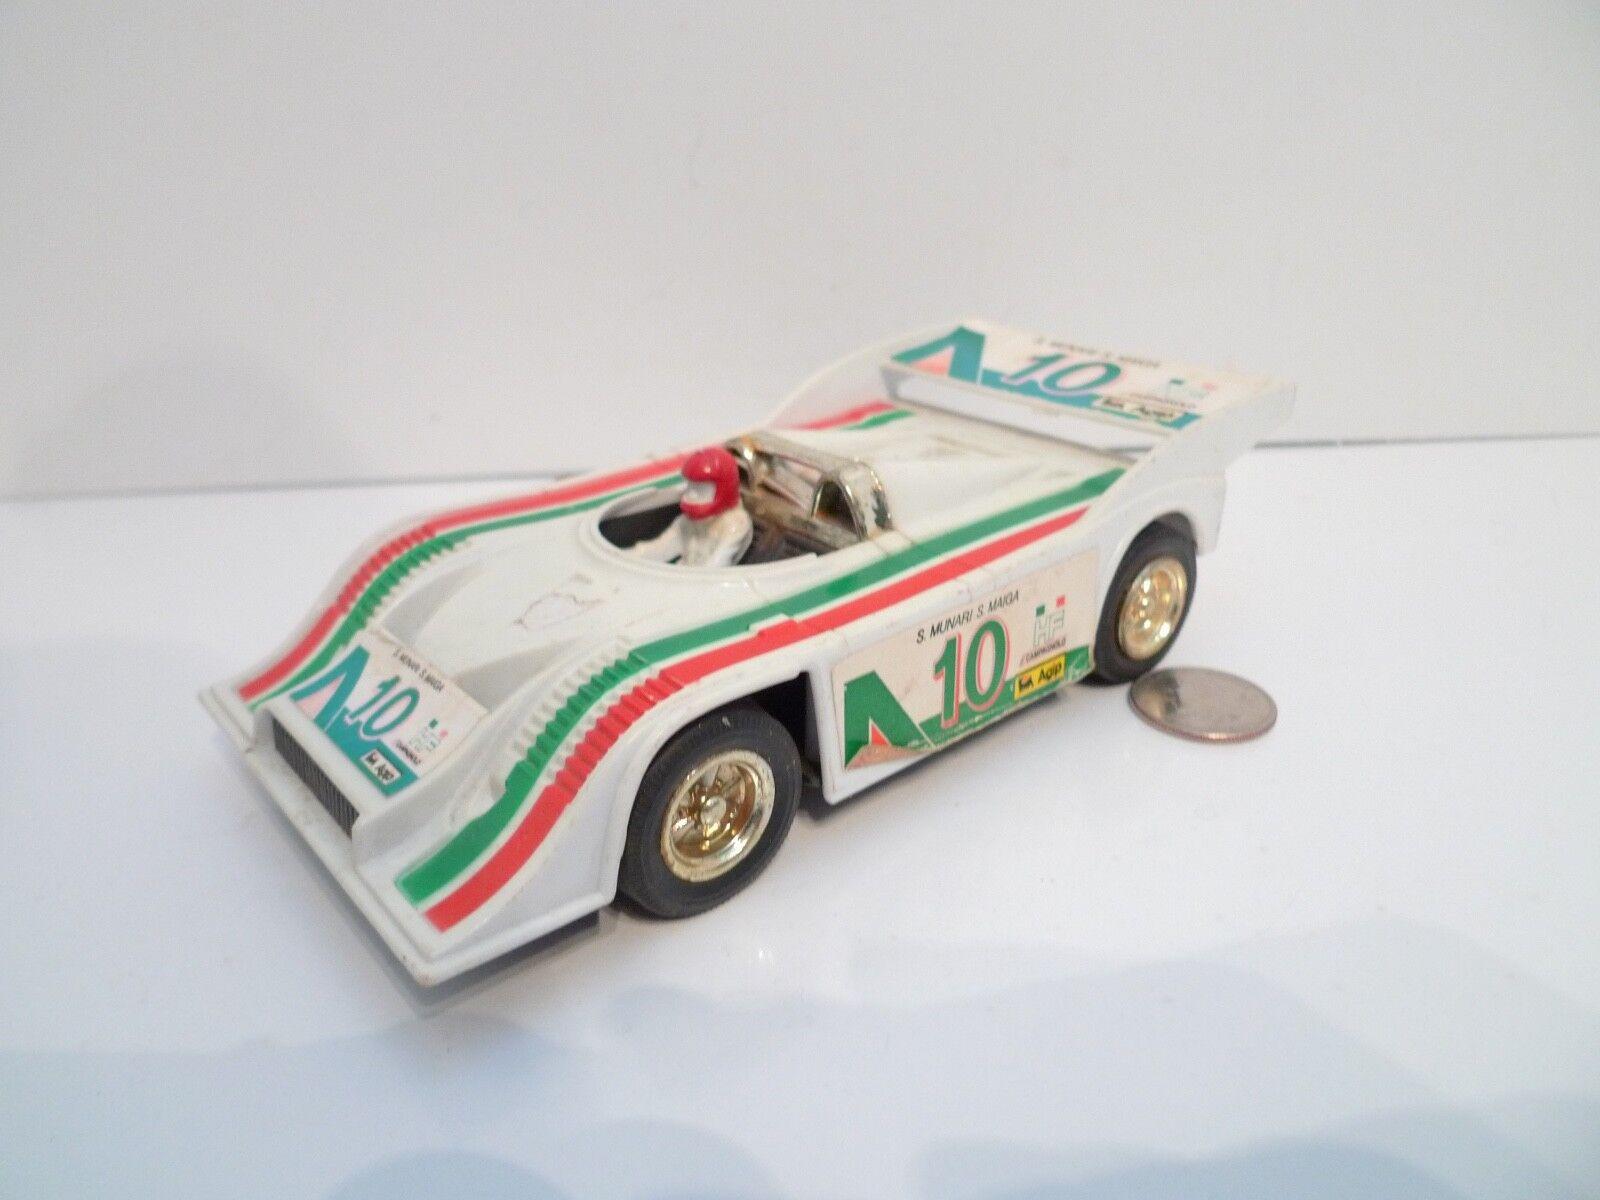 Vintage Roxy Toys S. Munari Maiga Agip Porsche Racing Car No. 384 friction